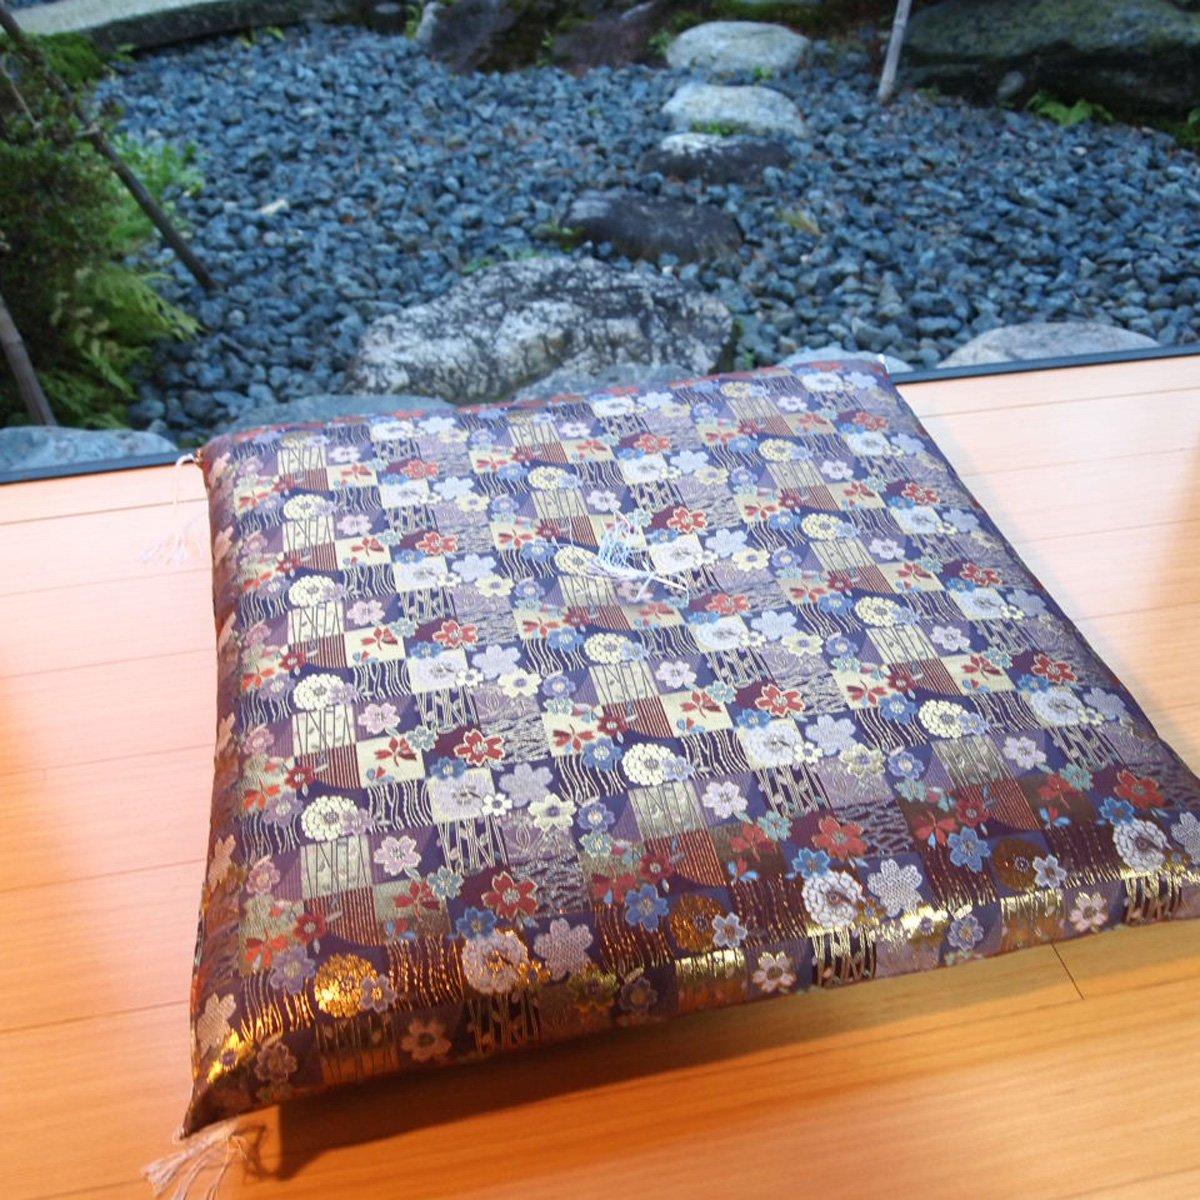 Four Seasons Handmade Japanese Brocade Fabric Zabuton Meditation Cushion 24.8× 25.1Inch Compressed cotton